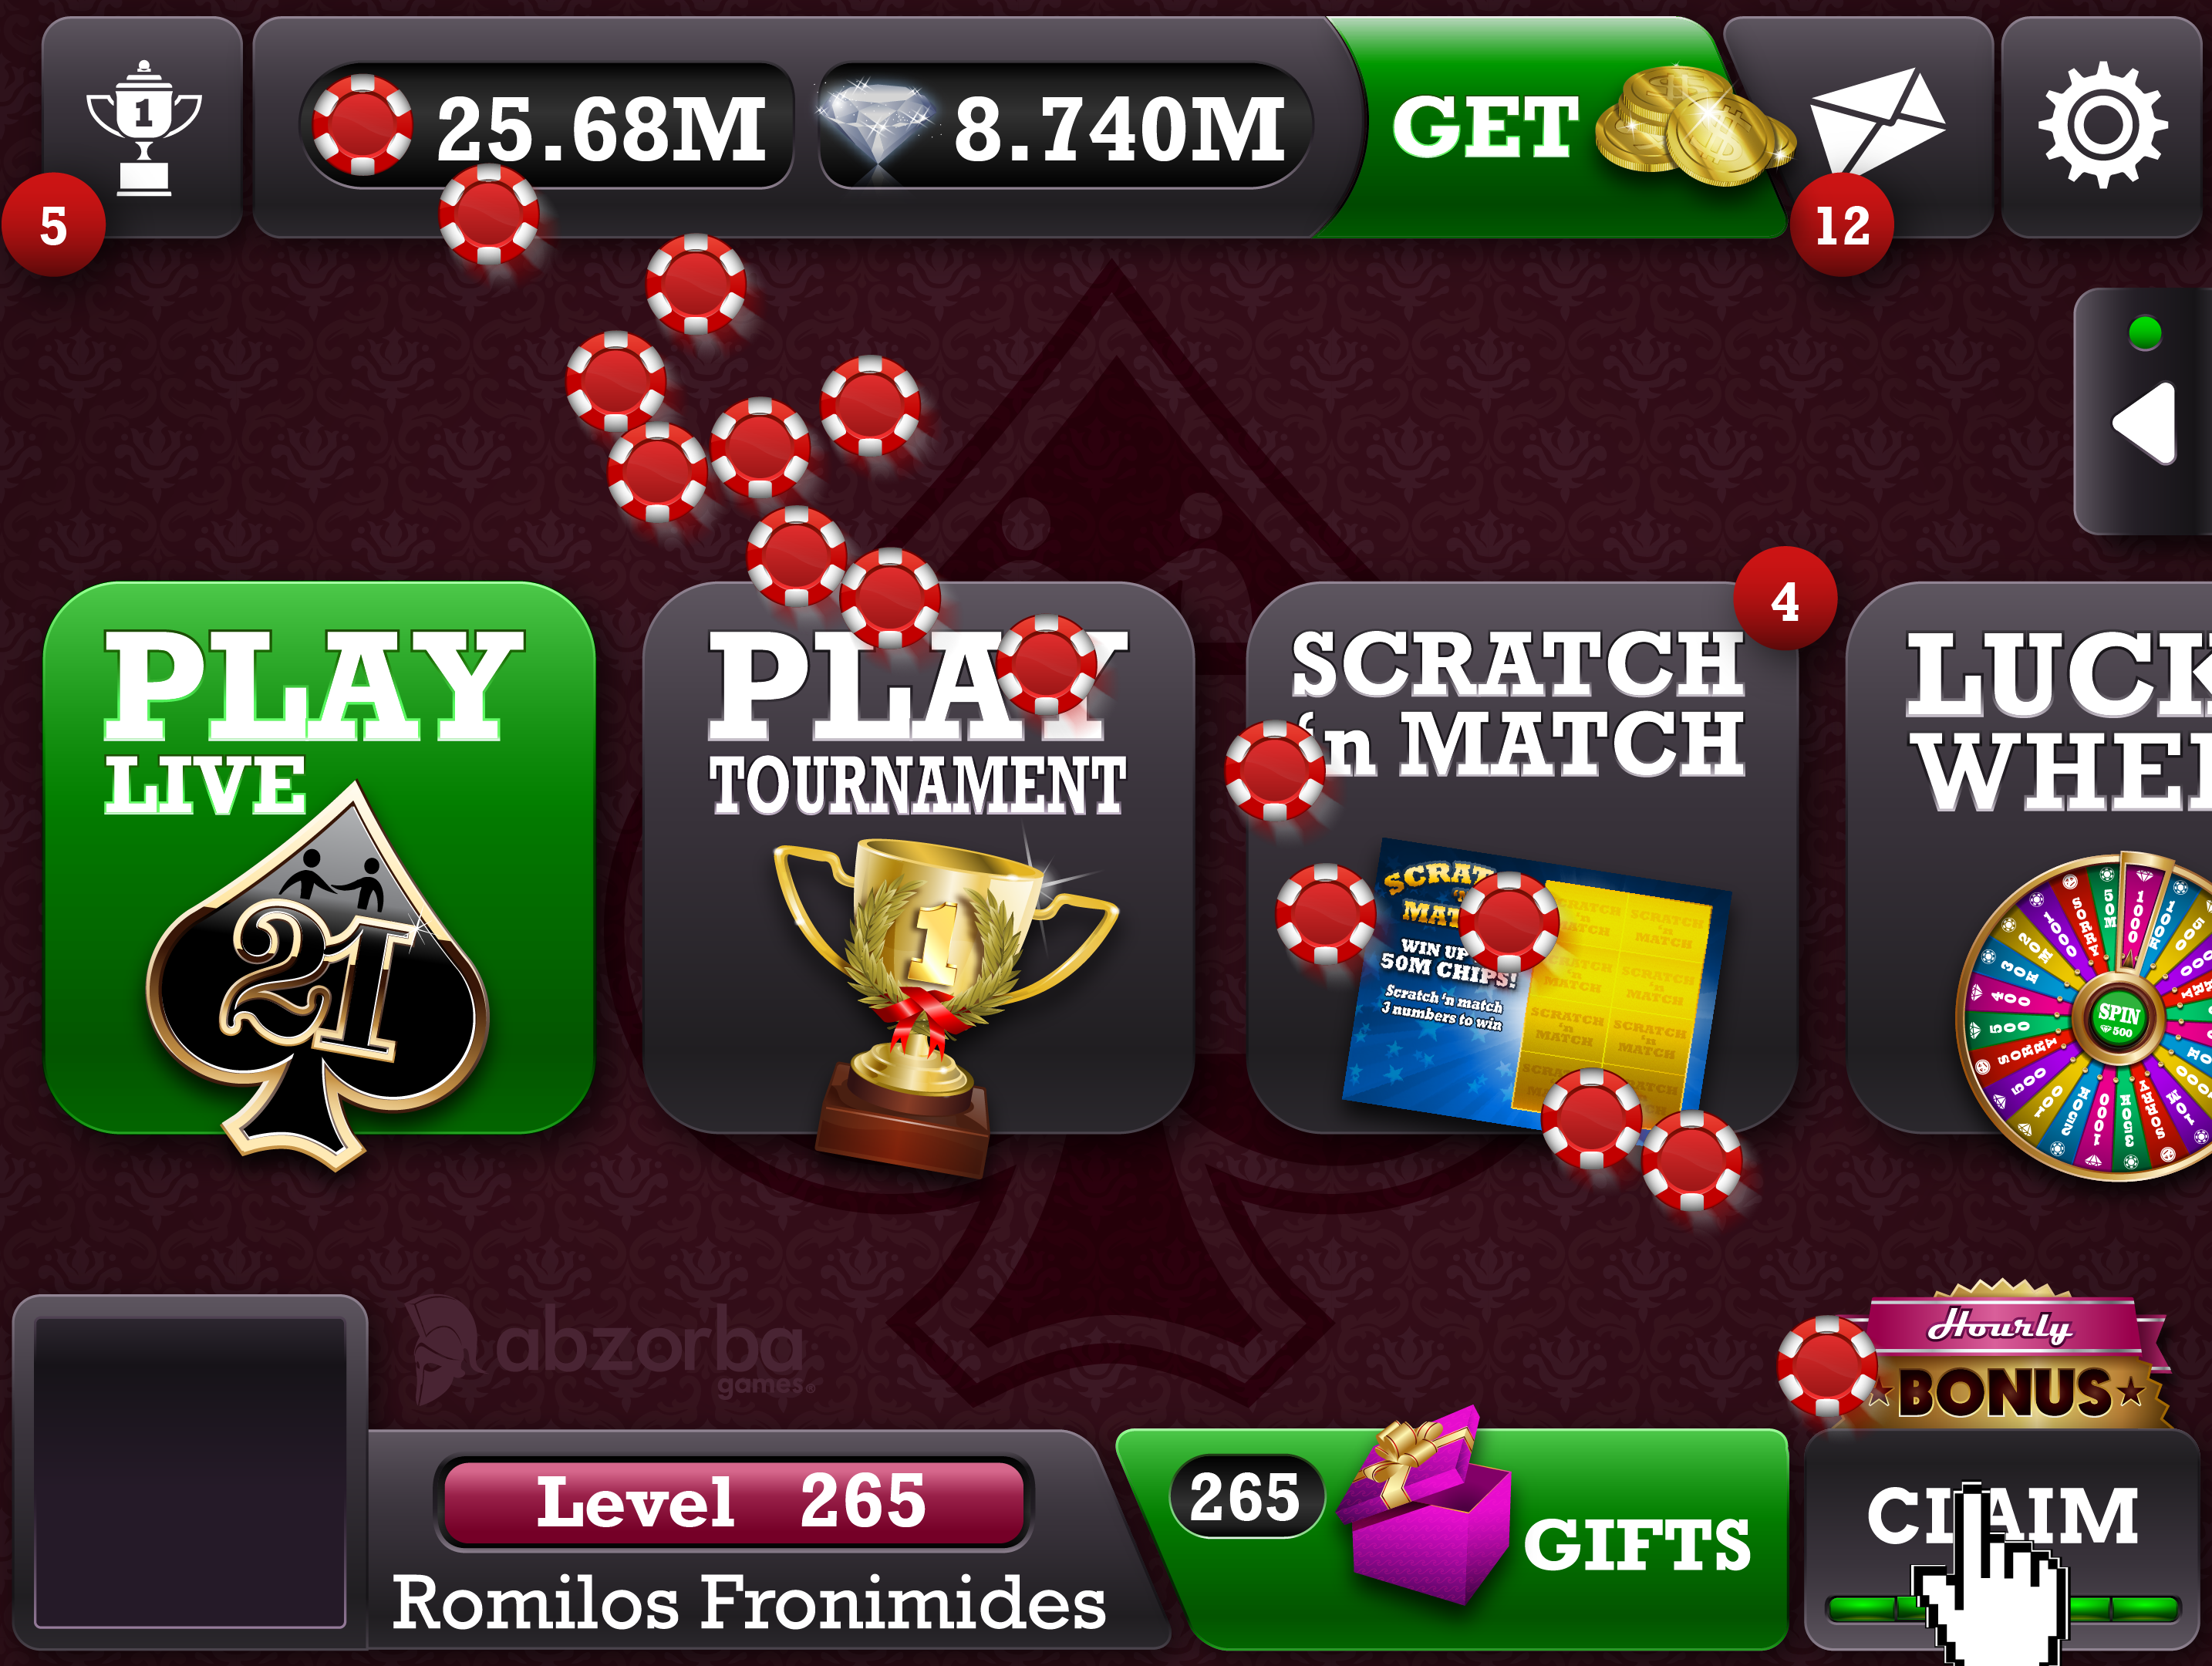 Bbling, bbling. Live Blackjack free download ios